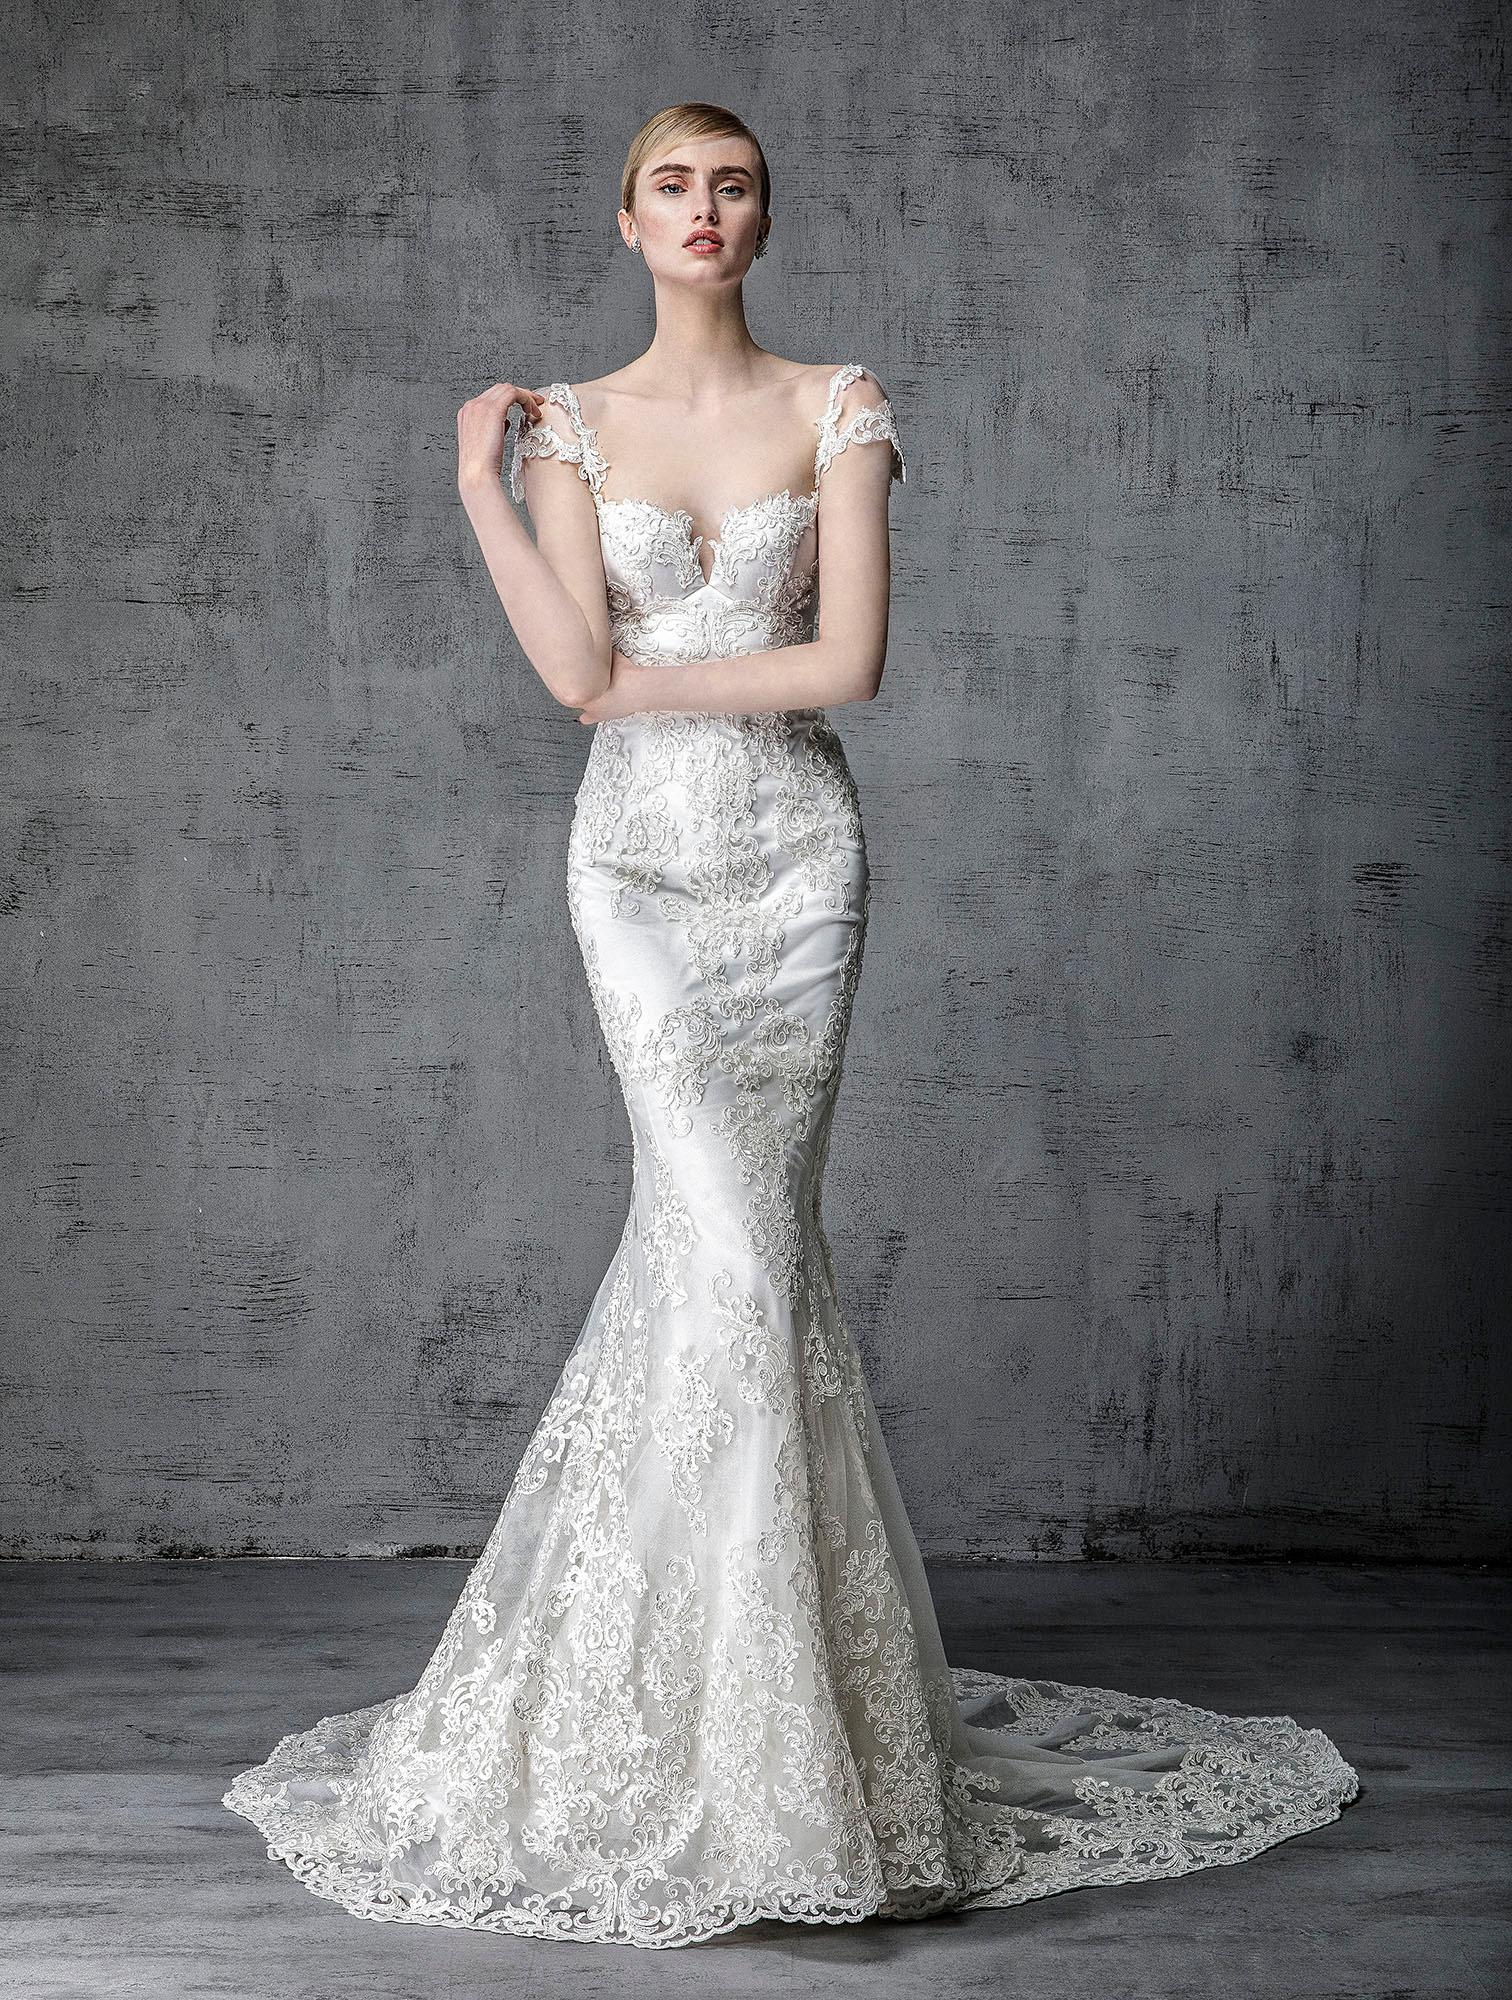 victoria kyriakides wedding dress spring 2019 cap-sleeved embroidered trumpet